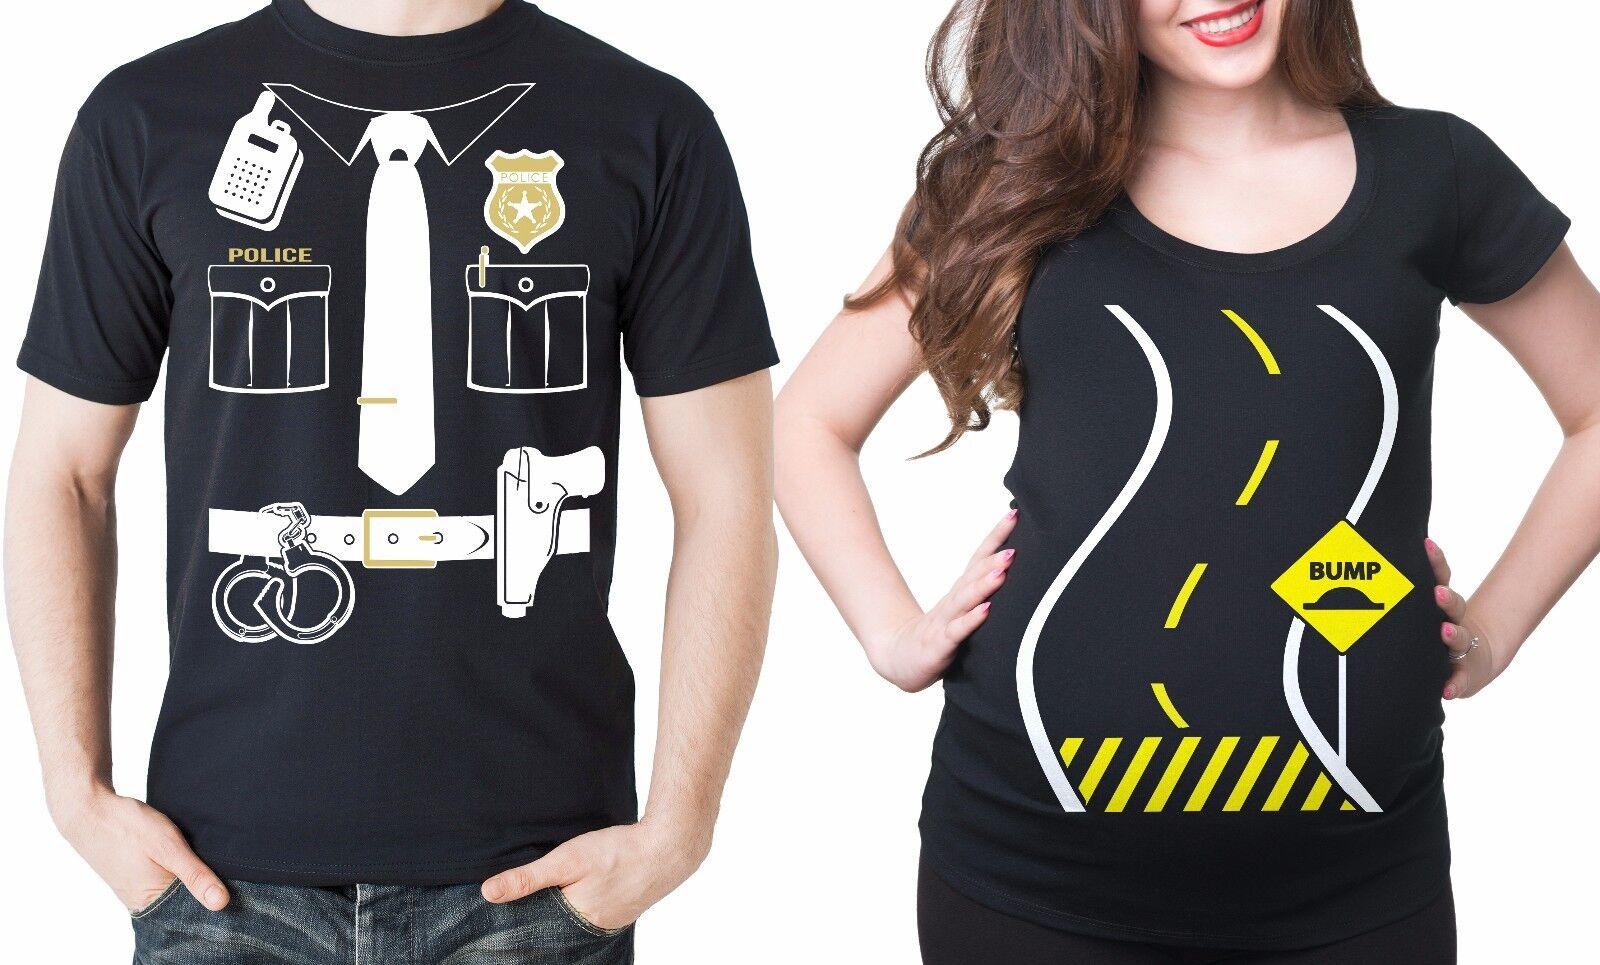 Bump Maternity T-shirt Police Officer Tee Shirt Halloween Costume Pregnancy Bump